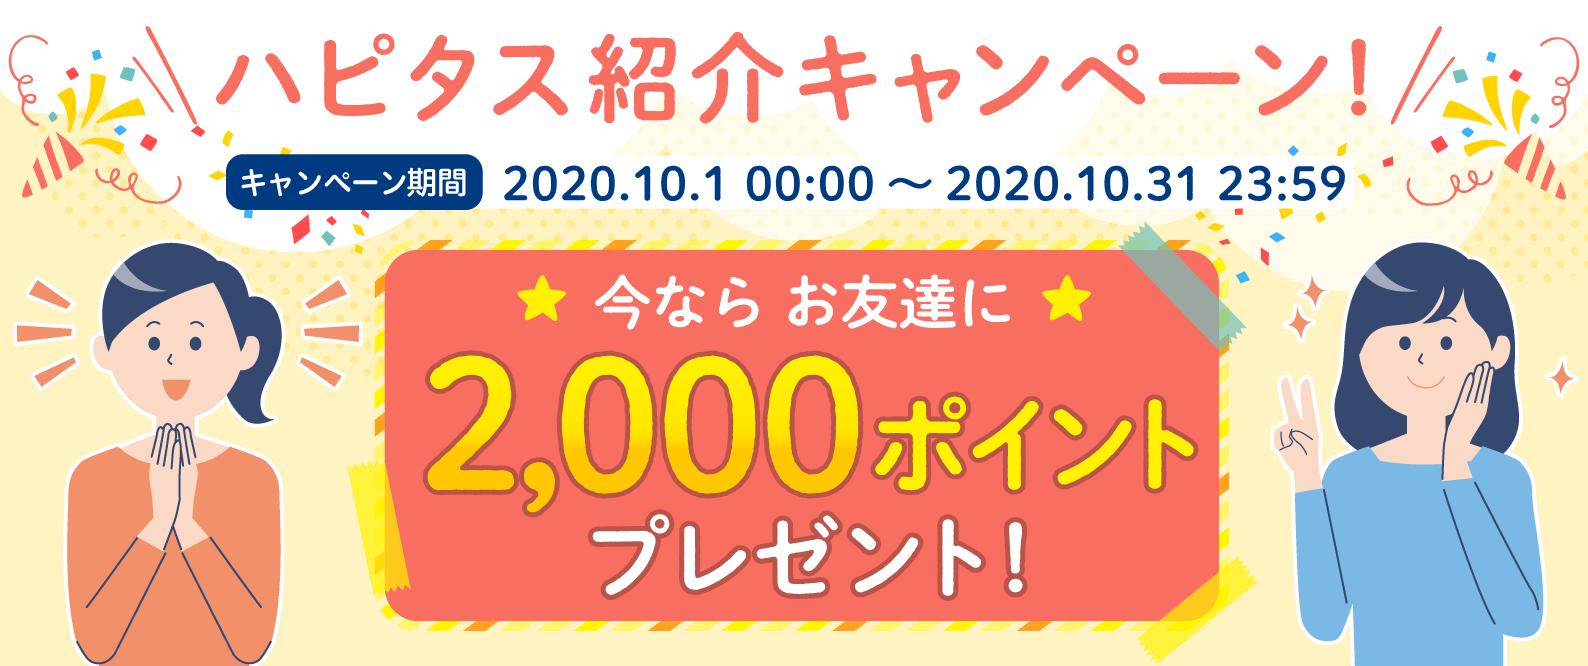 https://img.hapitas.jp/img/images/referral202010_asset/top.png